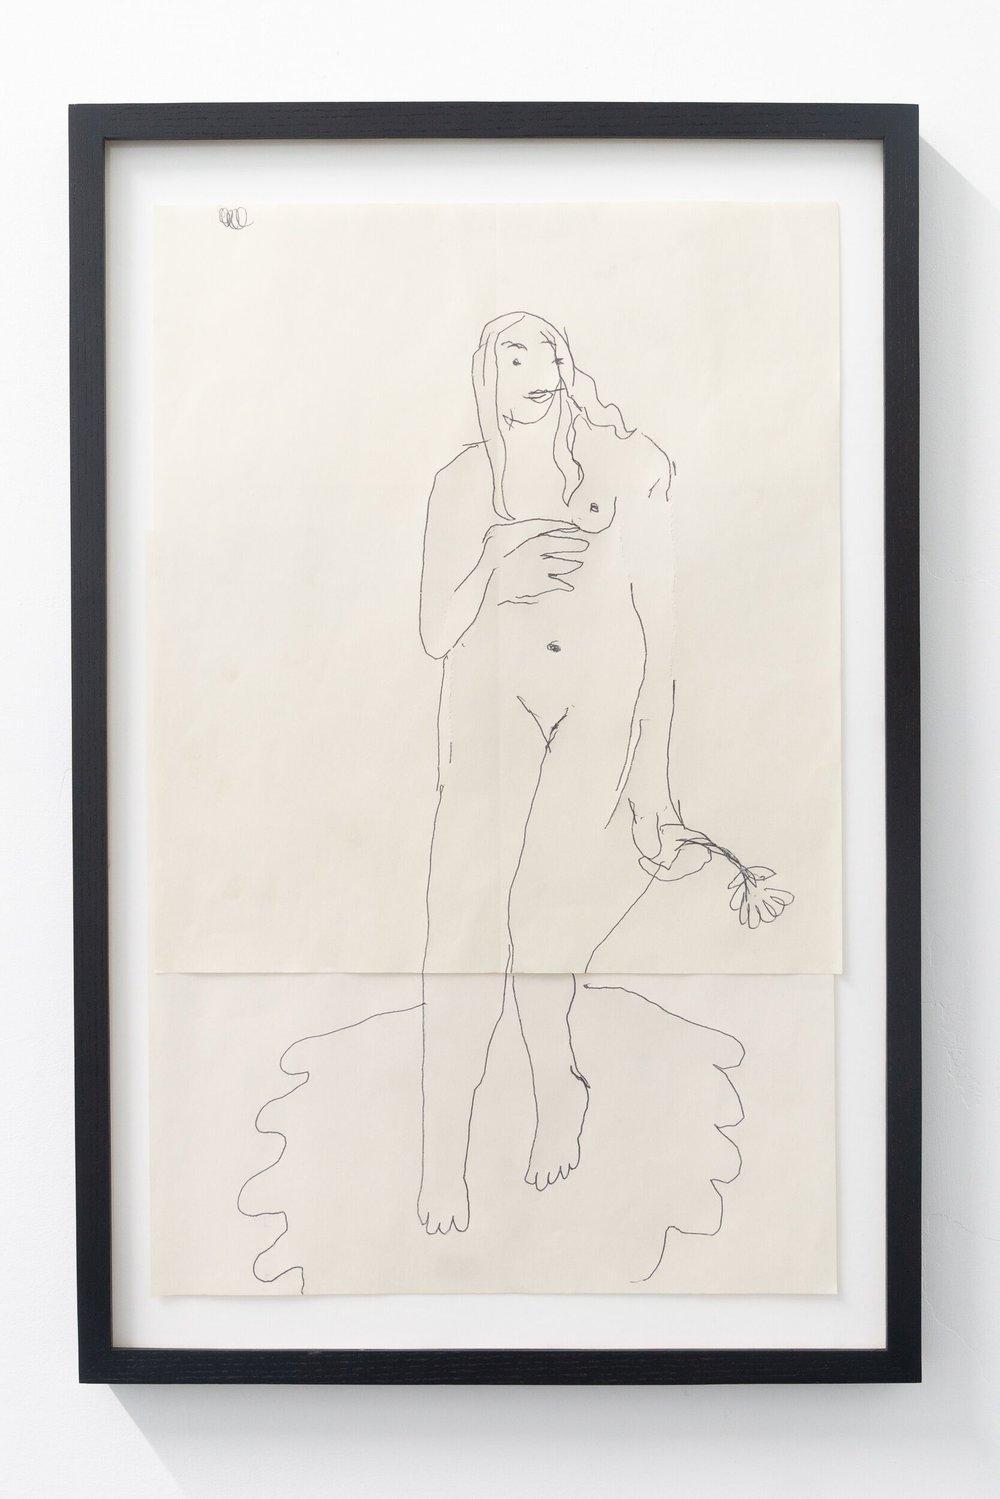 Emilie Gossiaux   Venus , 2018 Ink on newsprint 26 1/2 x 17 1/2 inches 67.3 x 44.5 cm